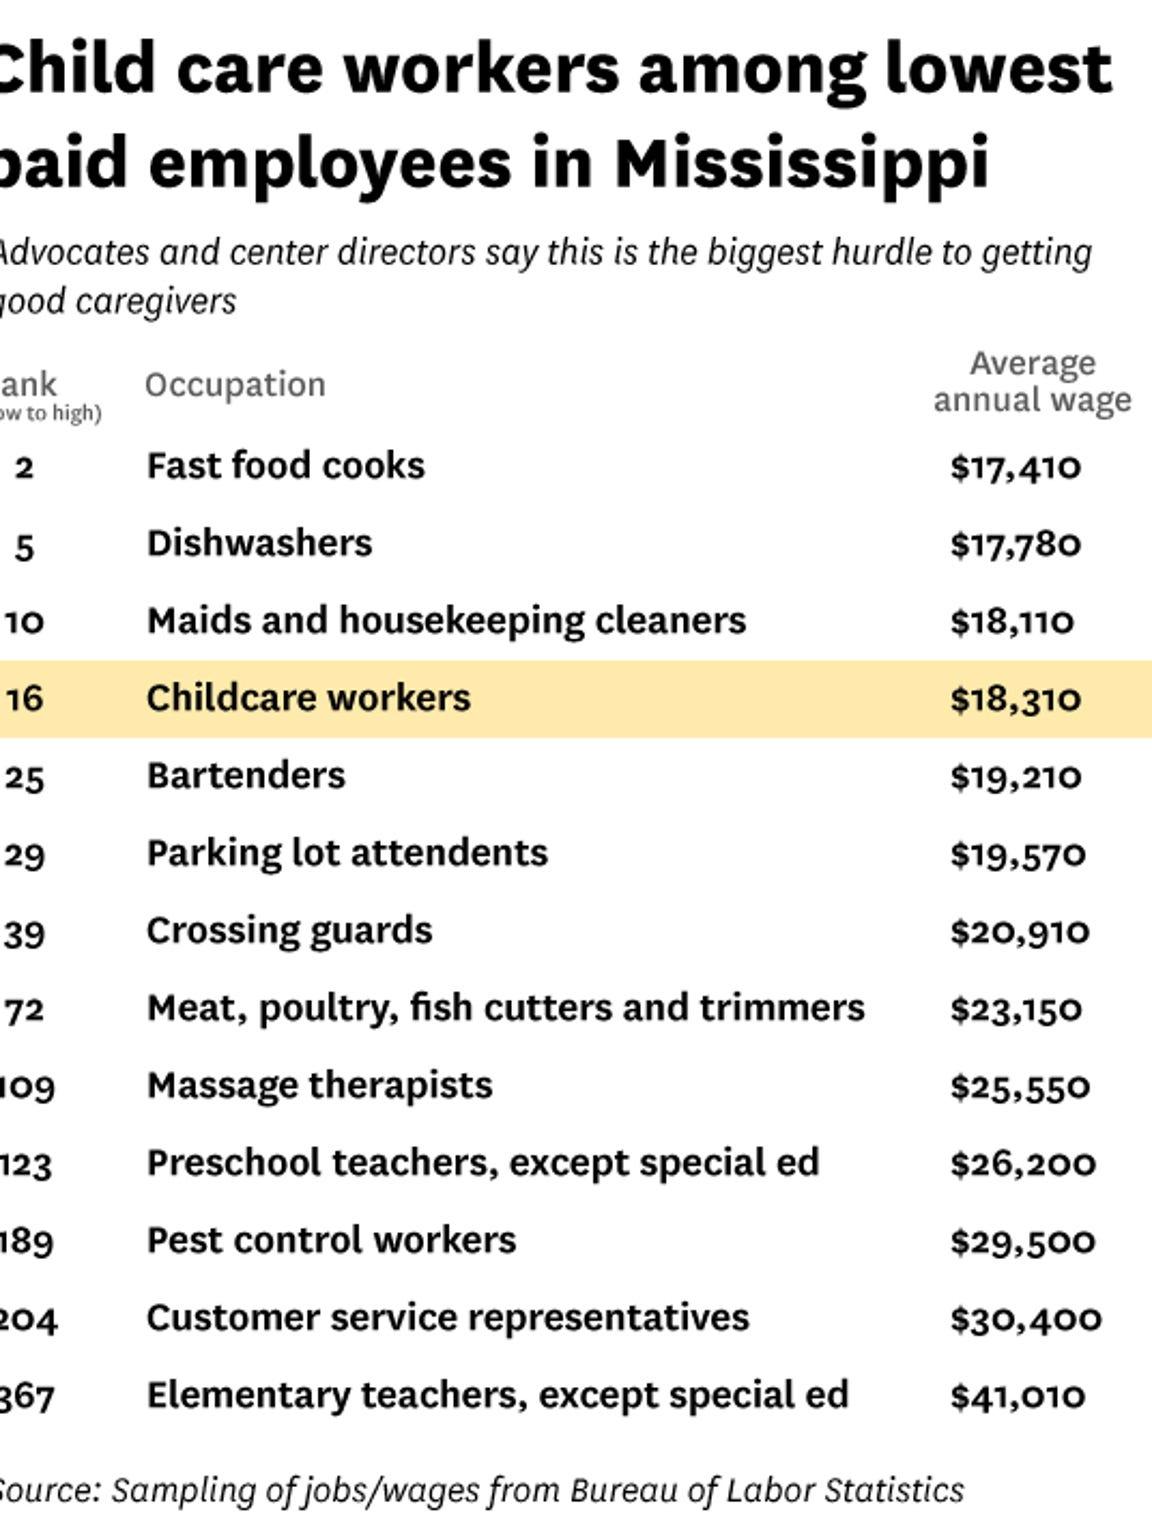 Salary comparisons